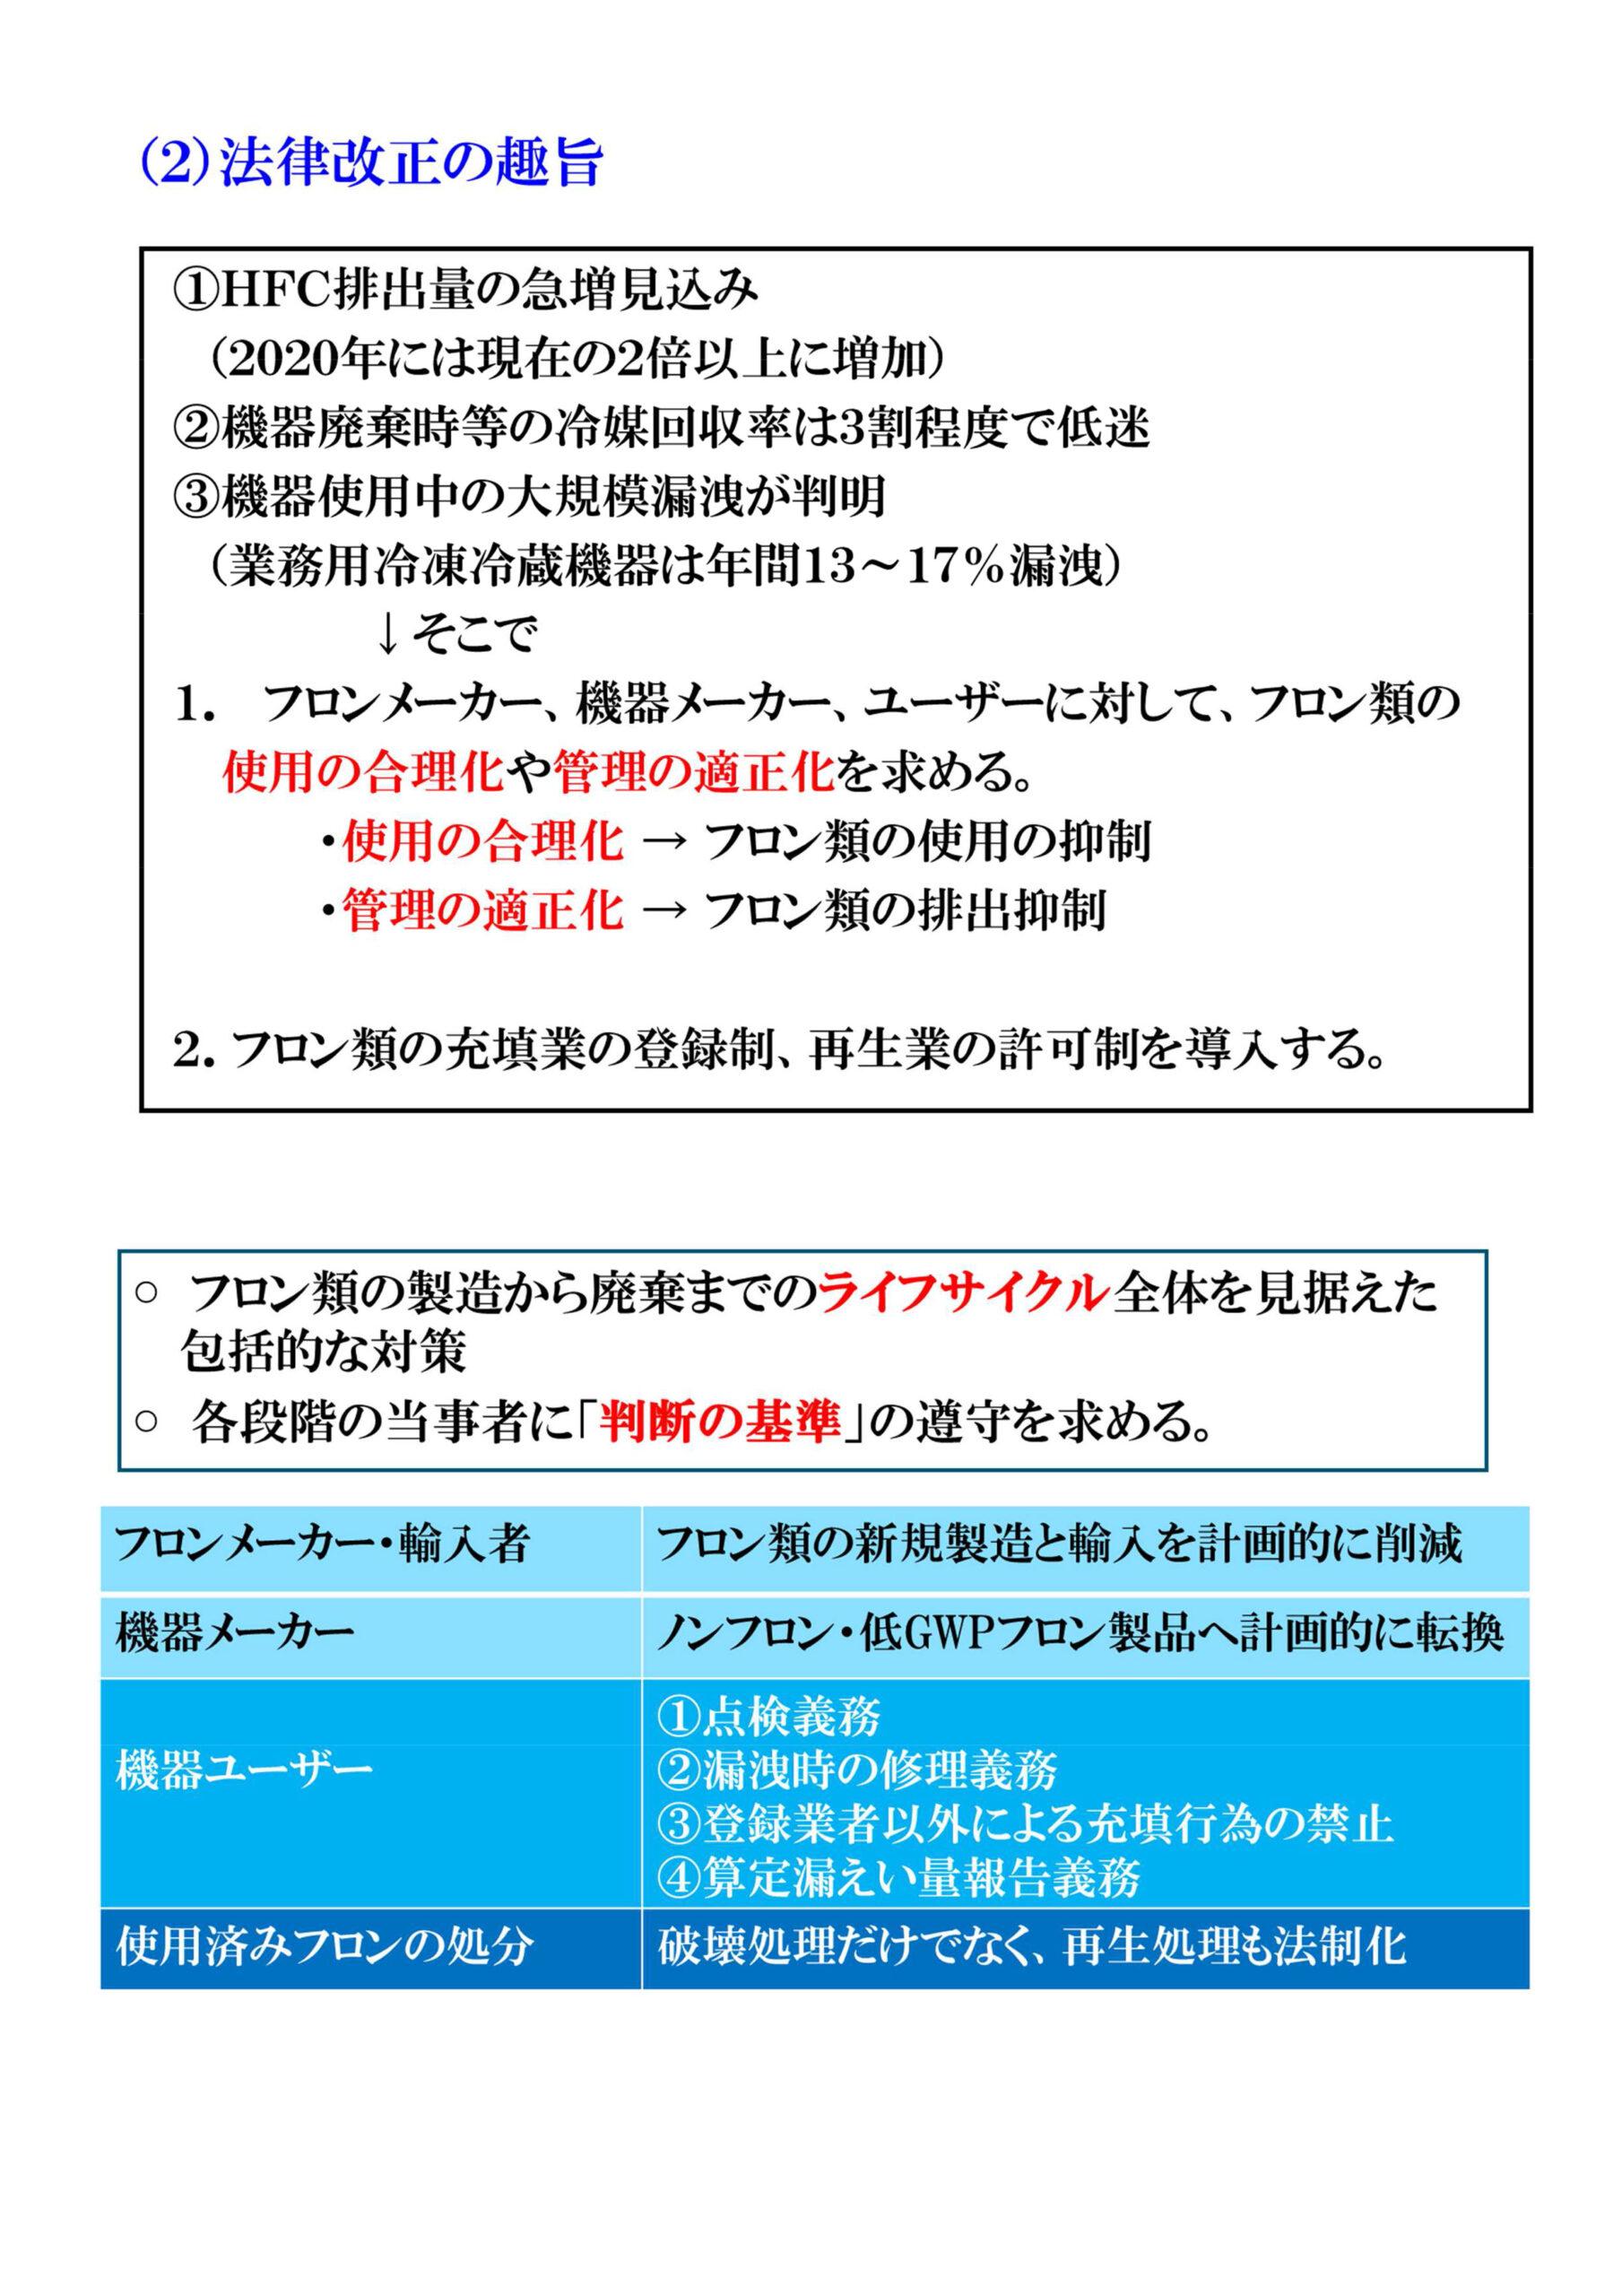 https://www.a-bex.com/wp/wp-content/uploads/2021/07/houkaisei-4-scaled.jpg